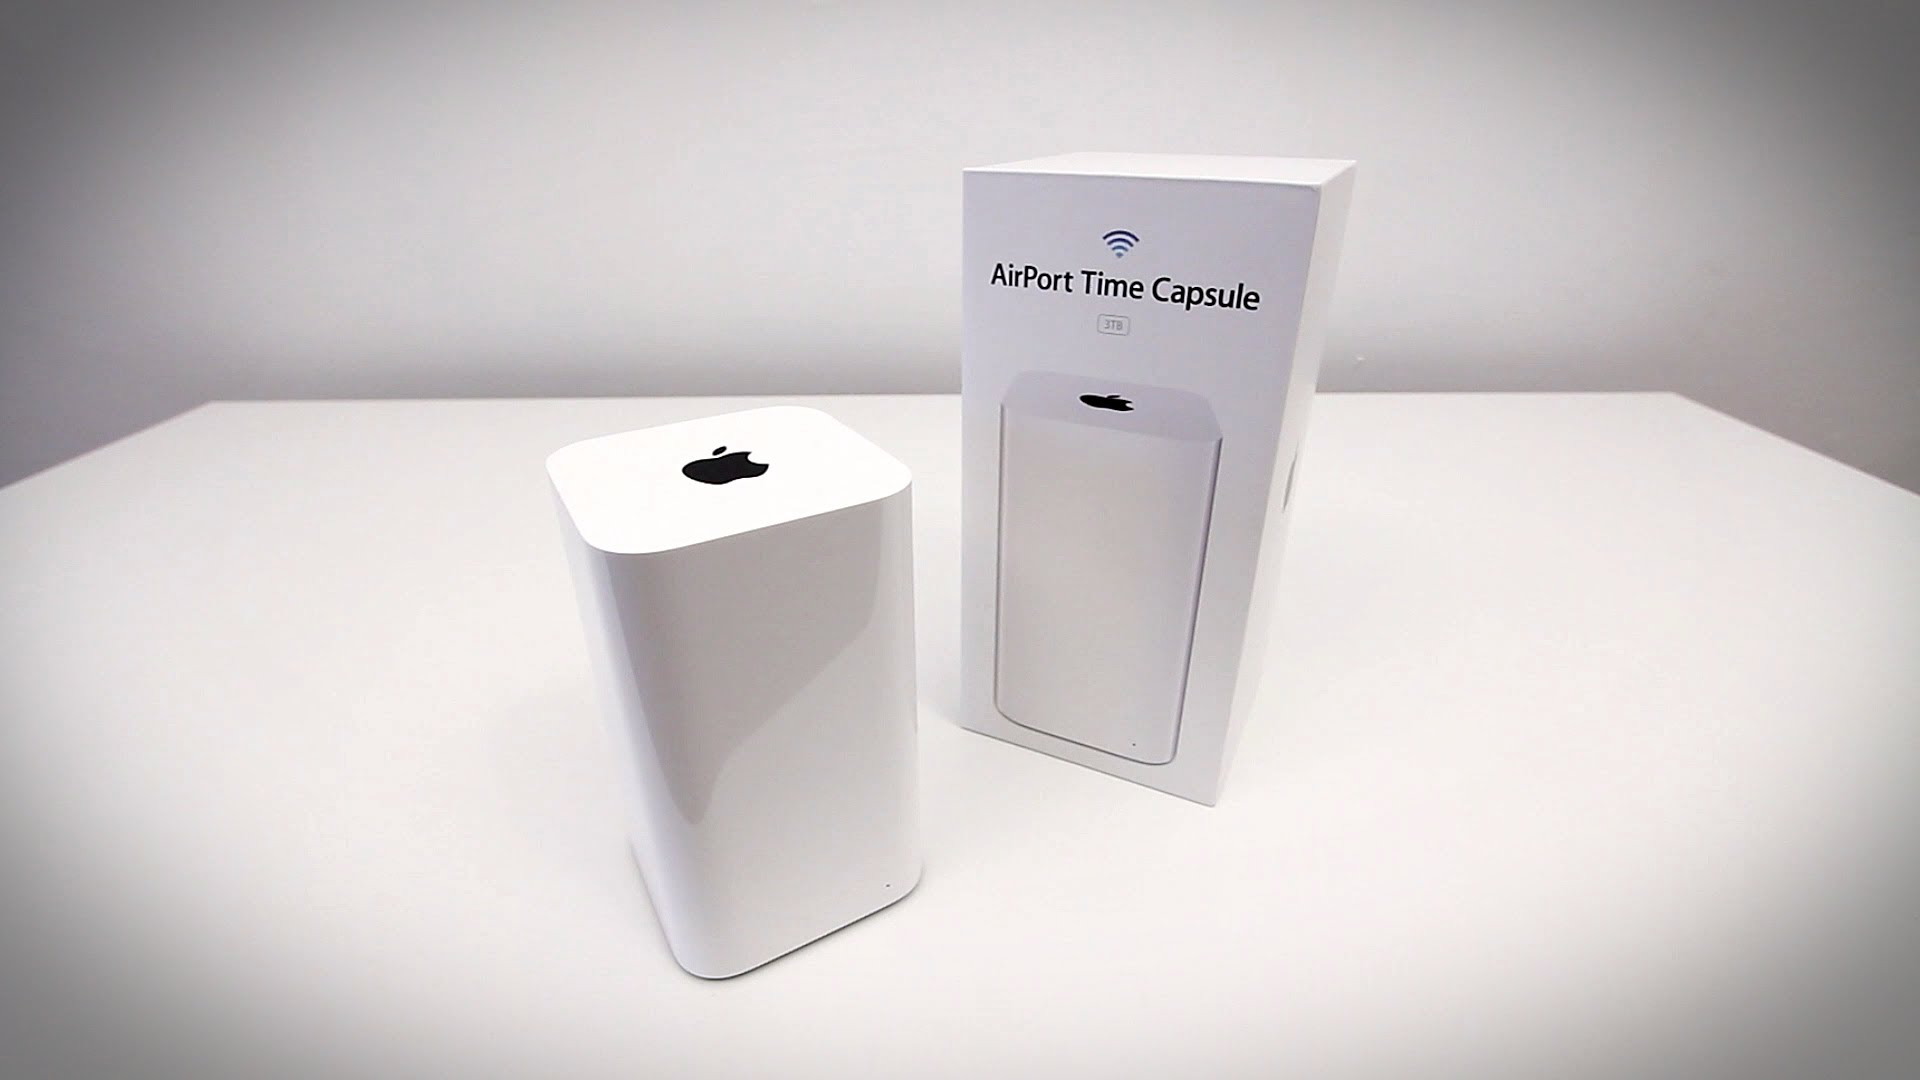 Apple AirPort Time Capsule - Высокоскоростная базовая Wi-Fi  станция с накопителем